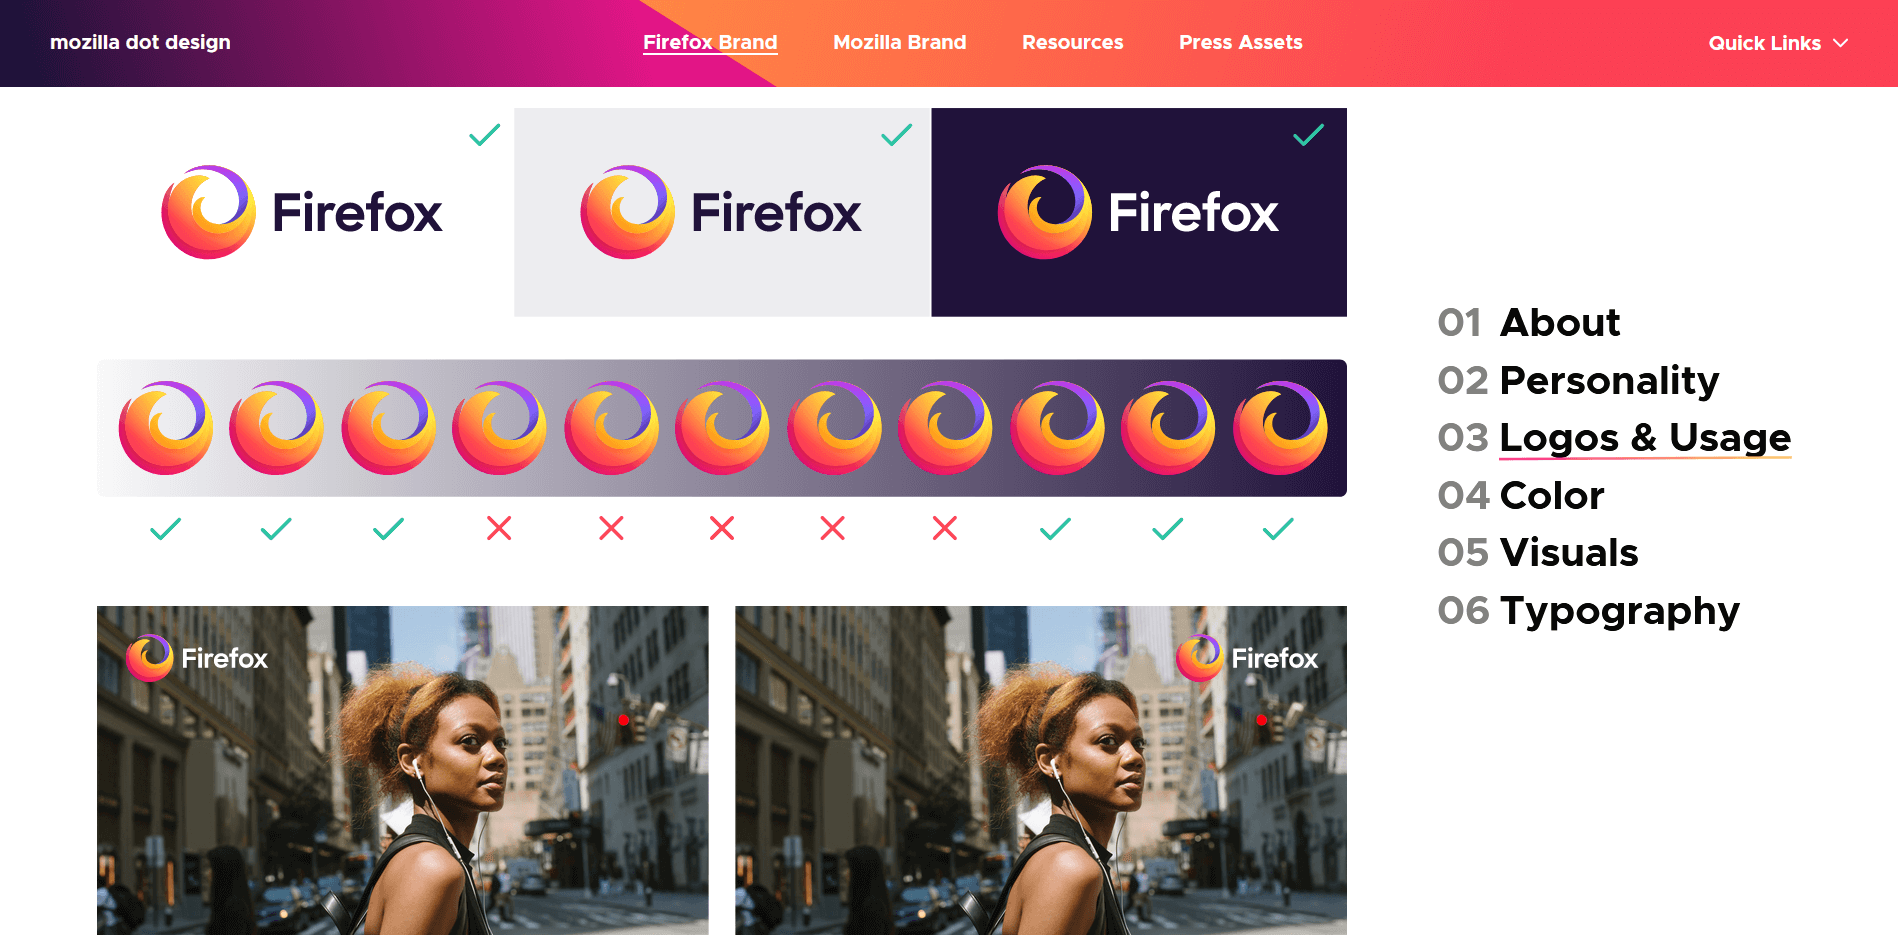 Firefox brand style guide logo usage